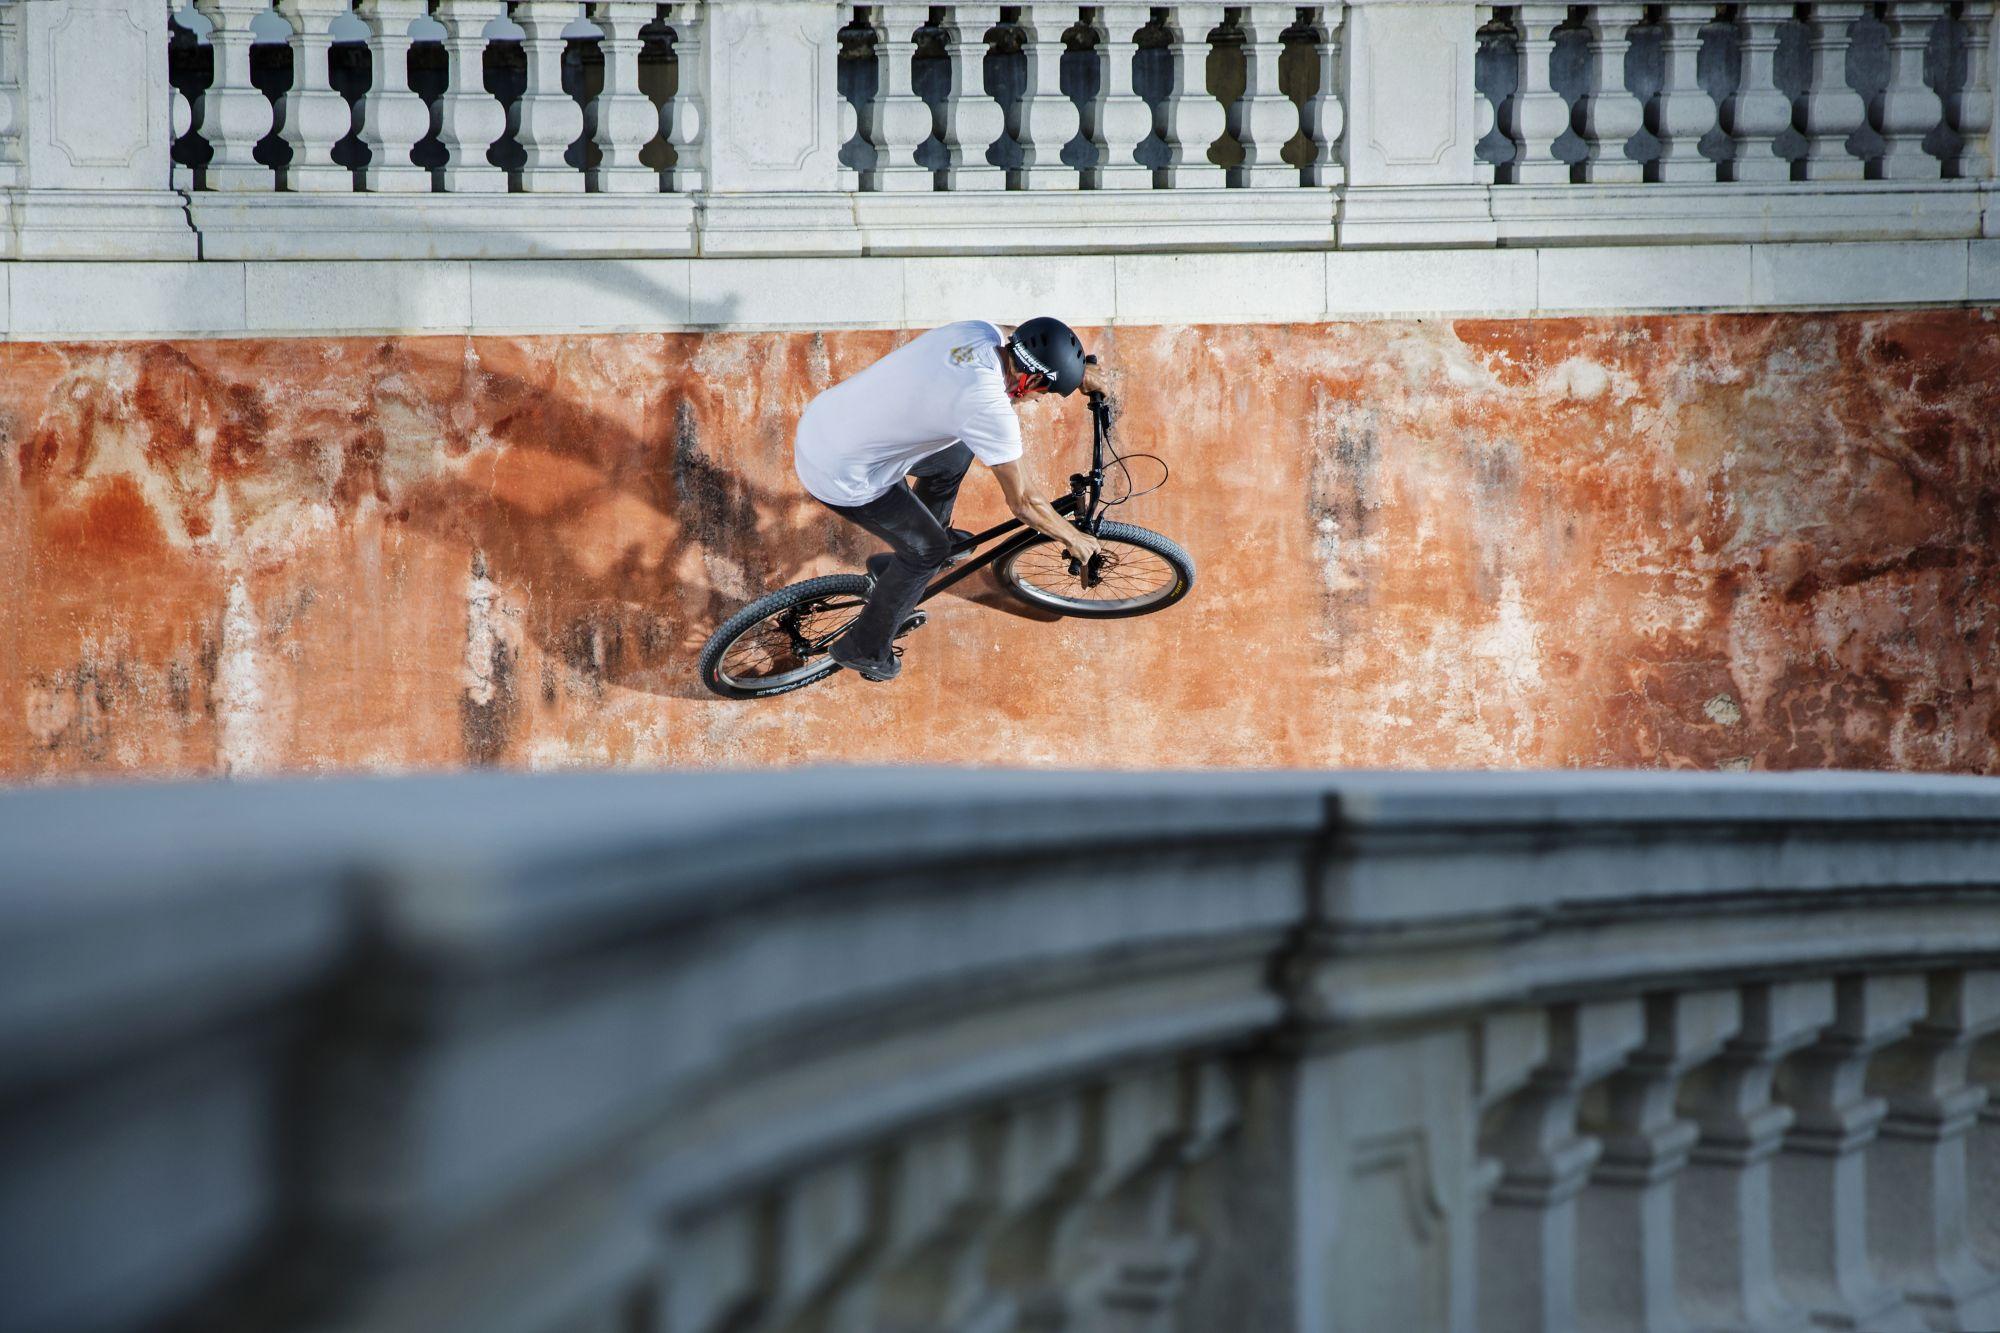 Dominik Raab fährt einen Wallride im Schloss Hof